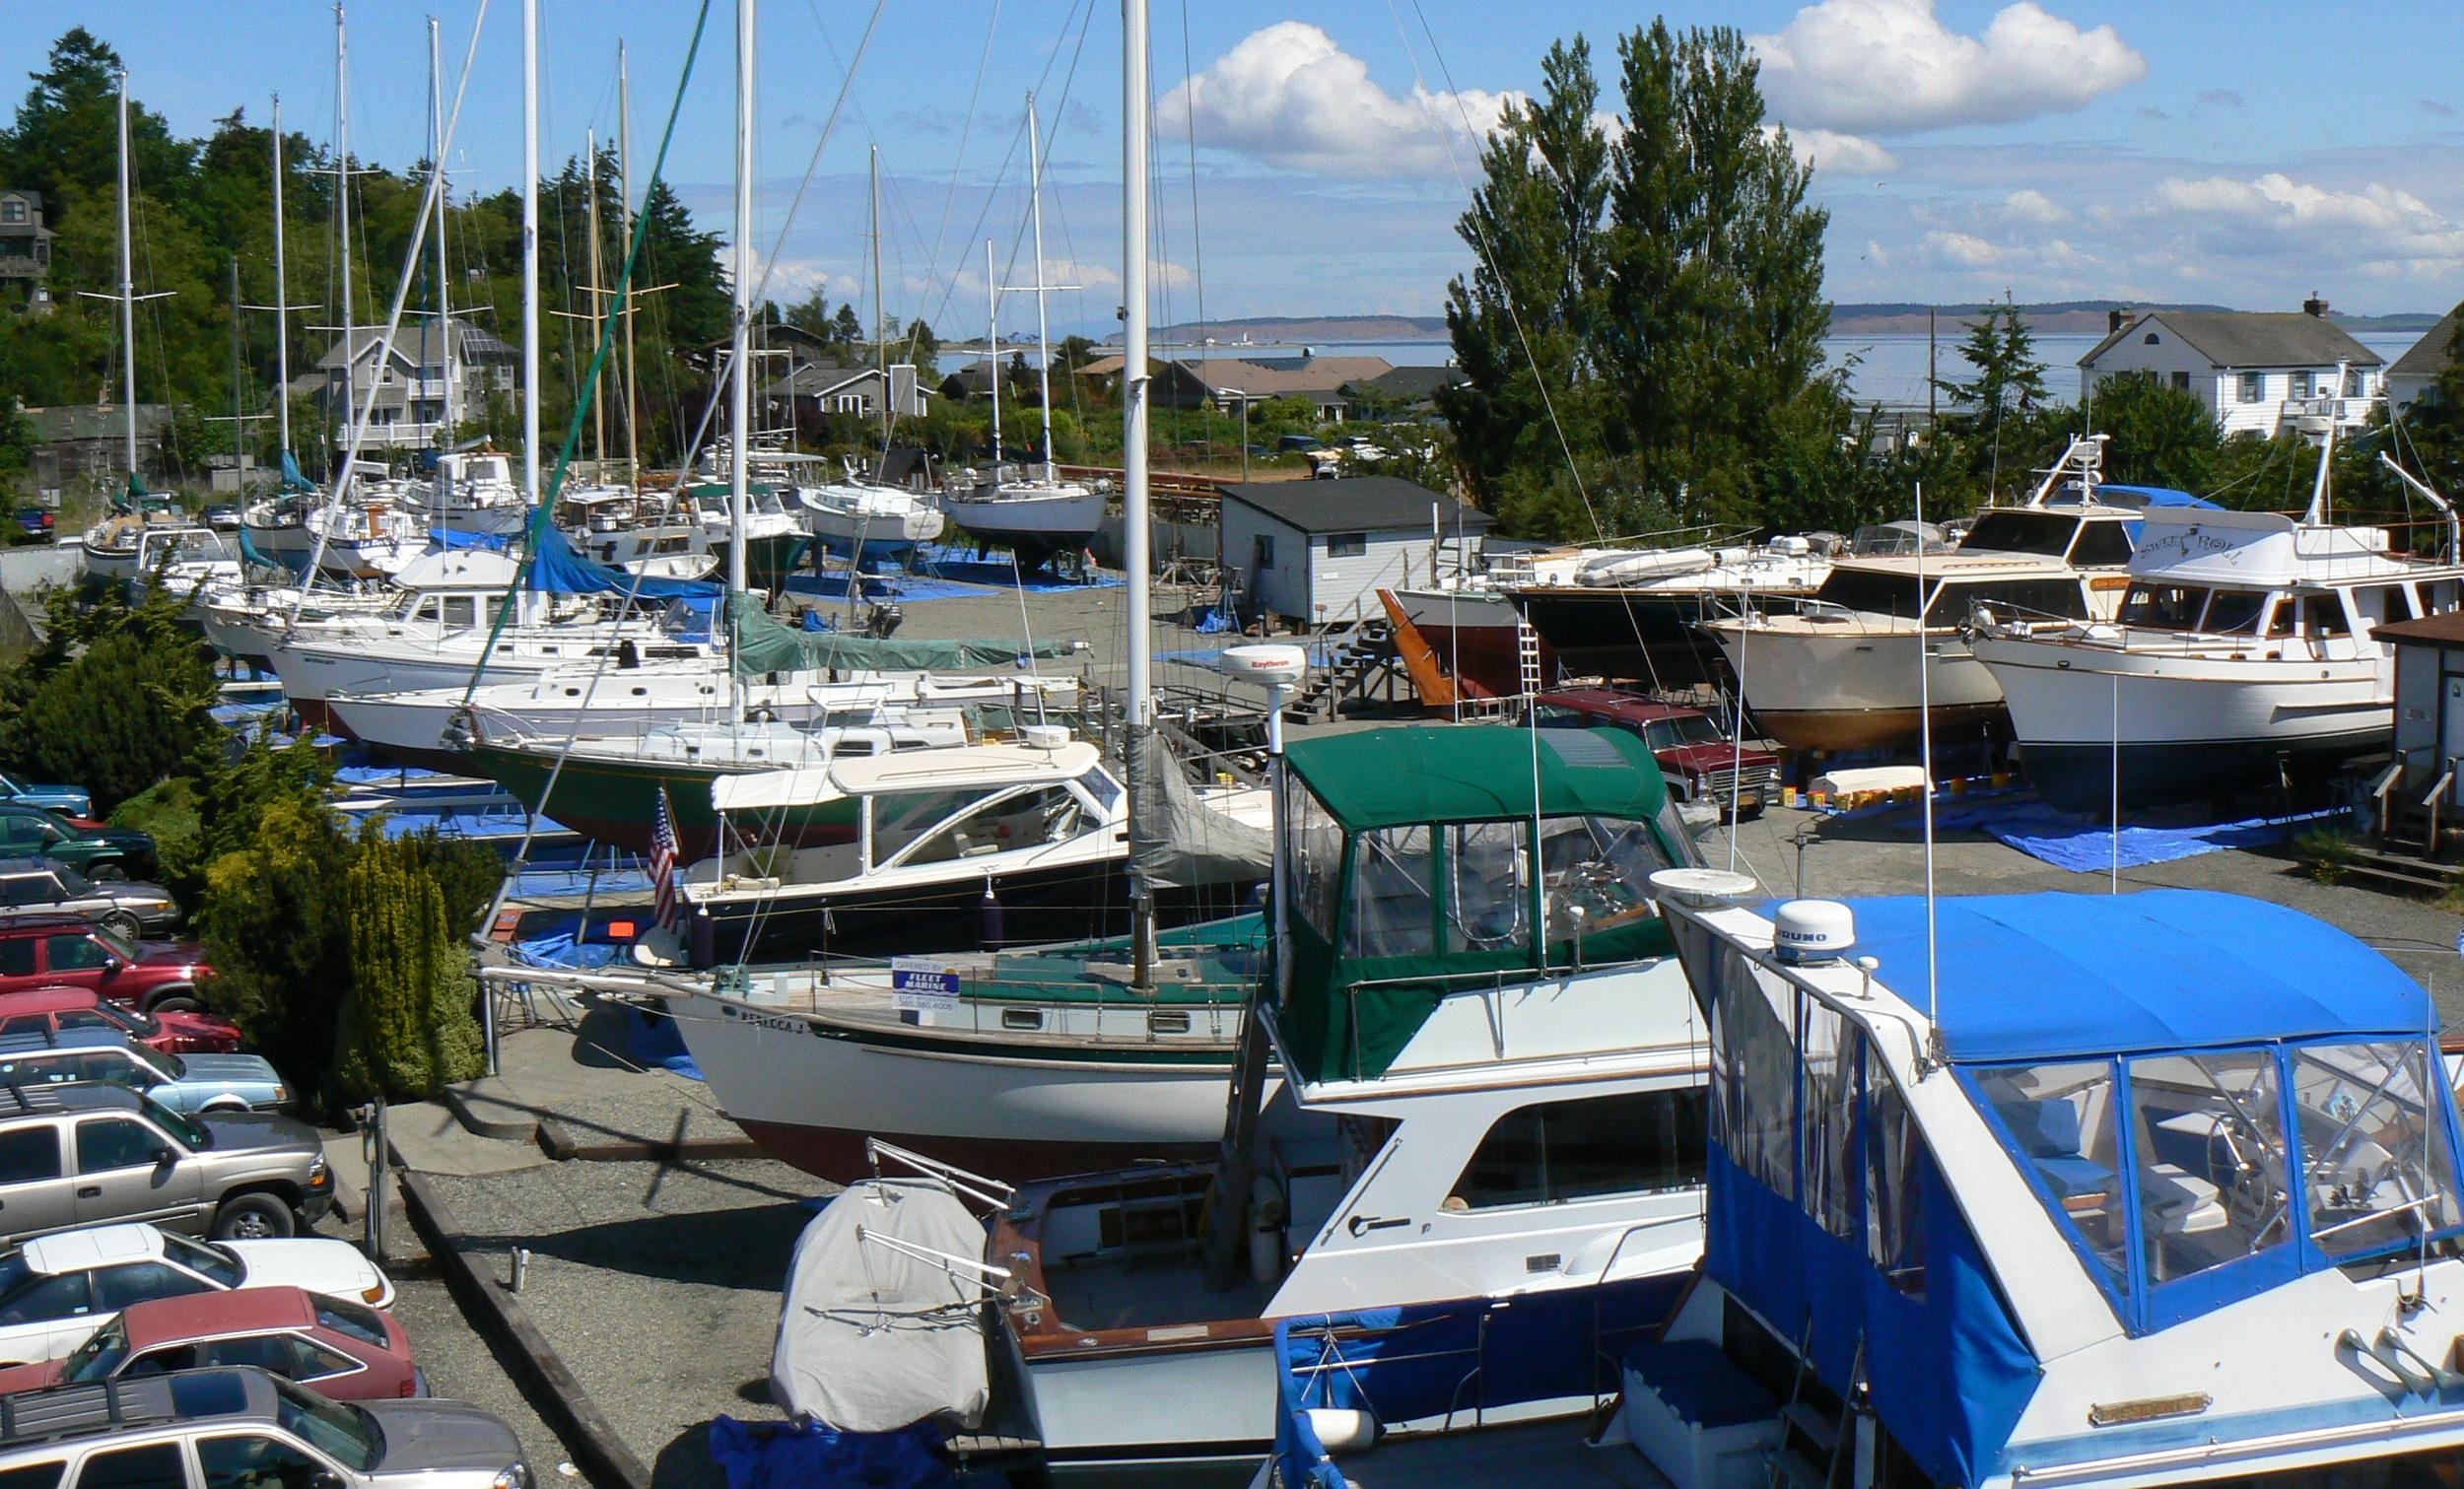 Boat-Yard.jpg